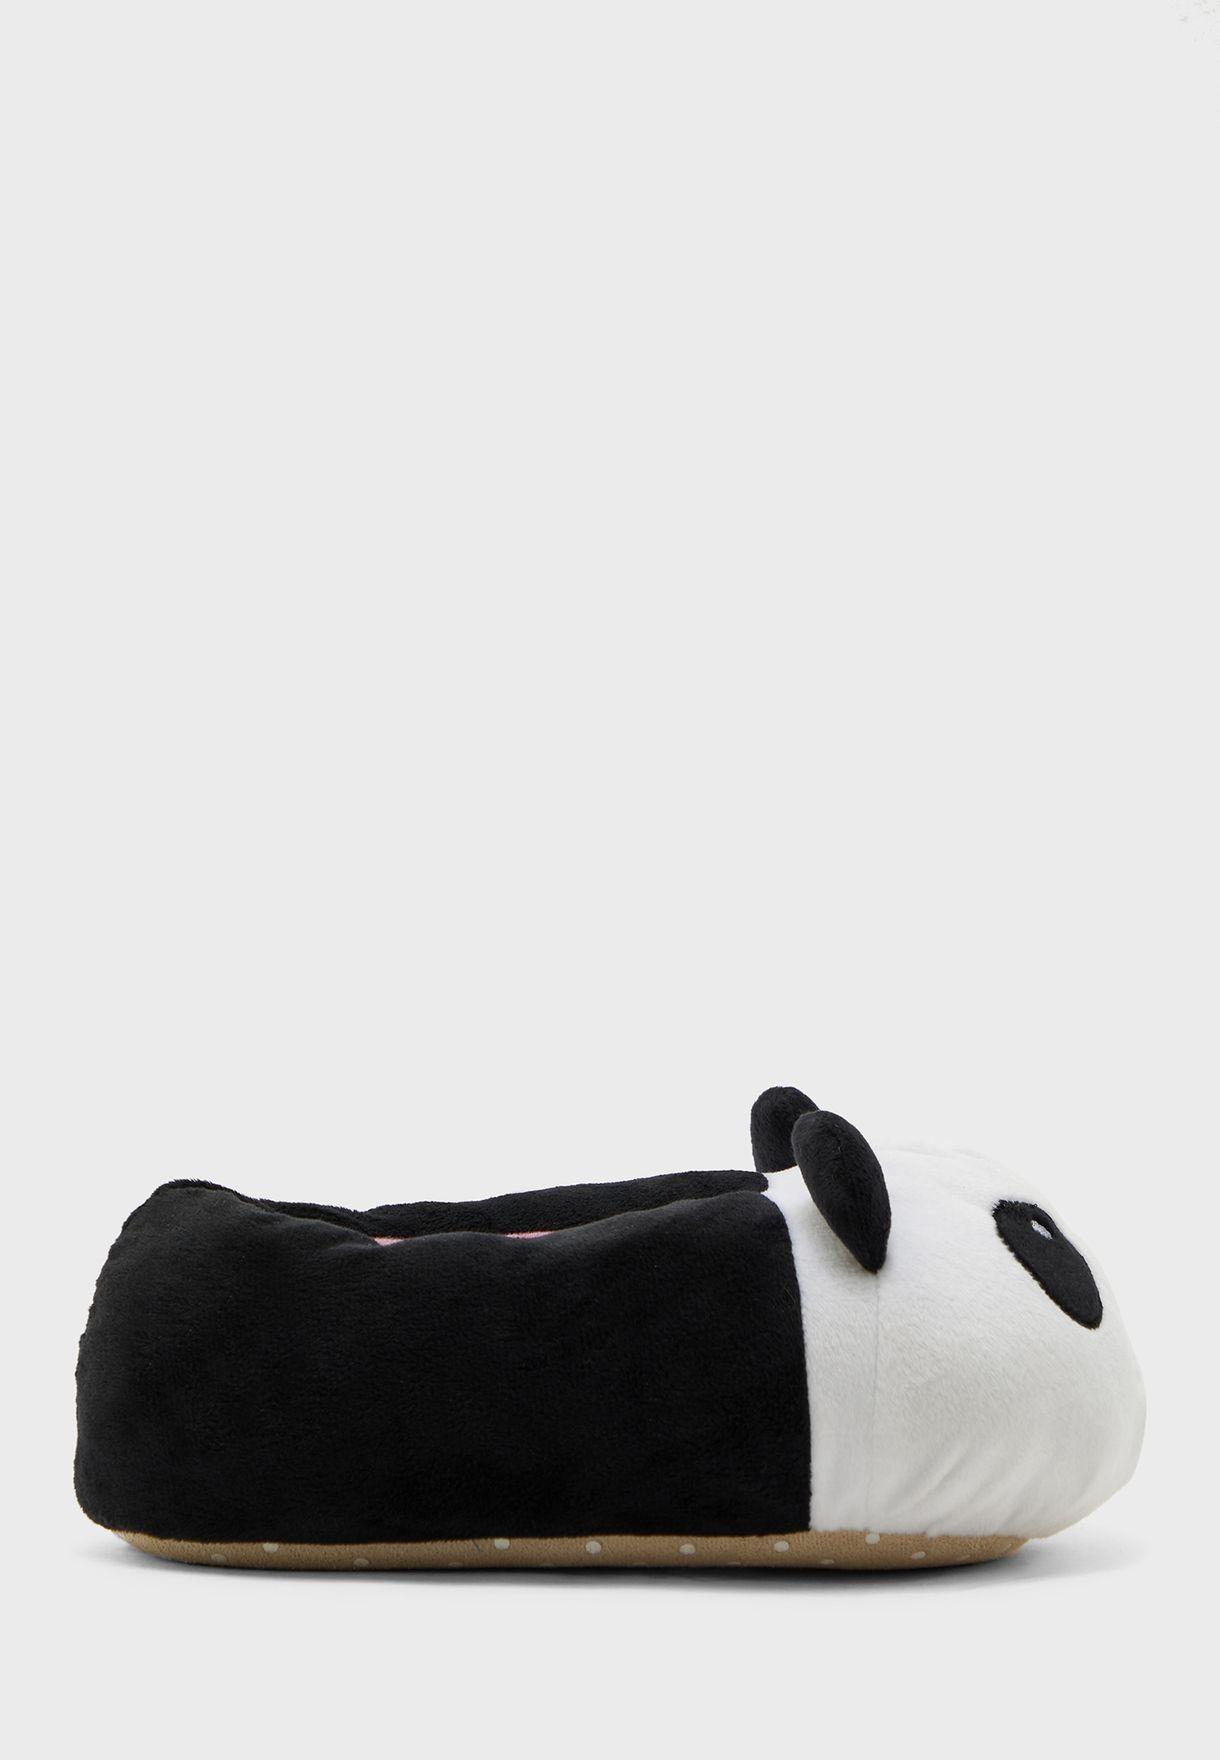 Panda Bedroom Slip On